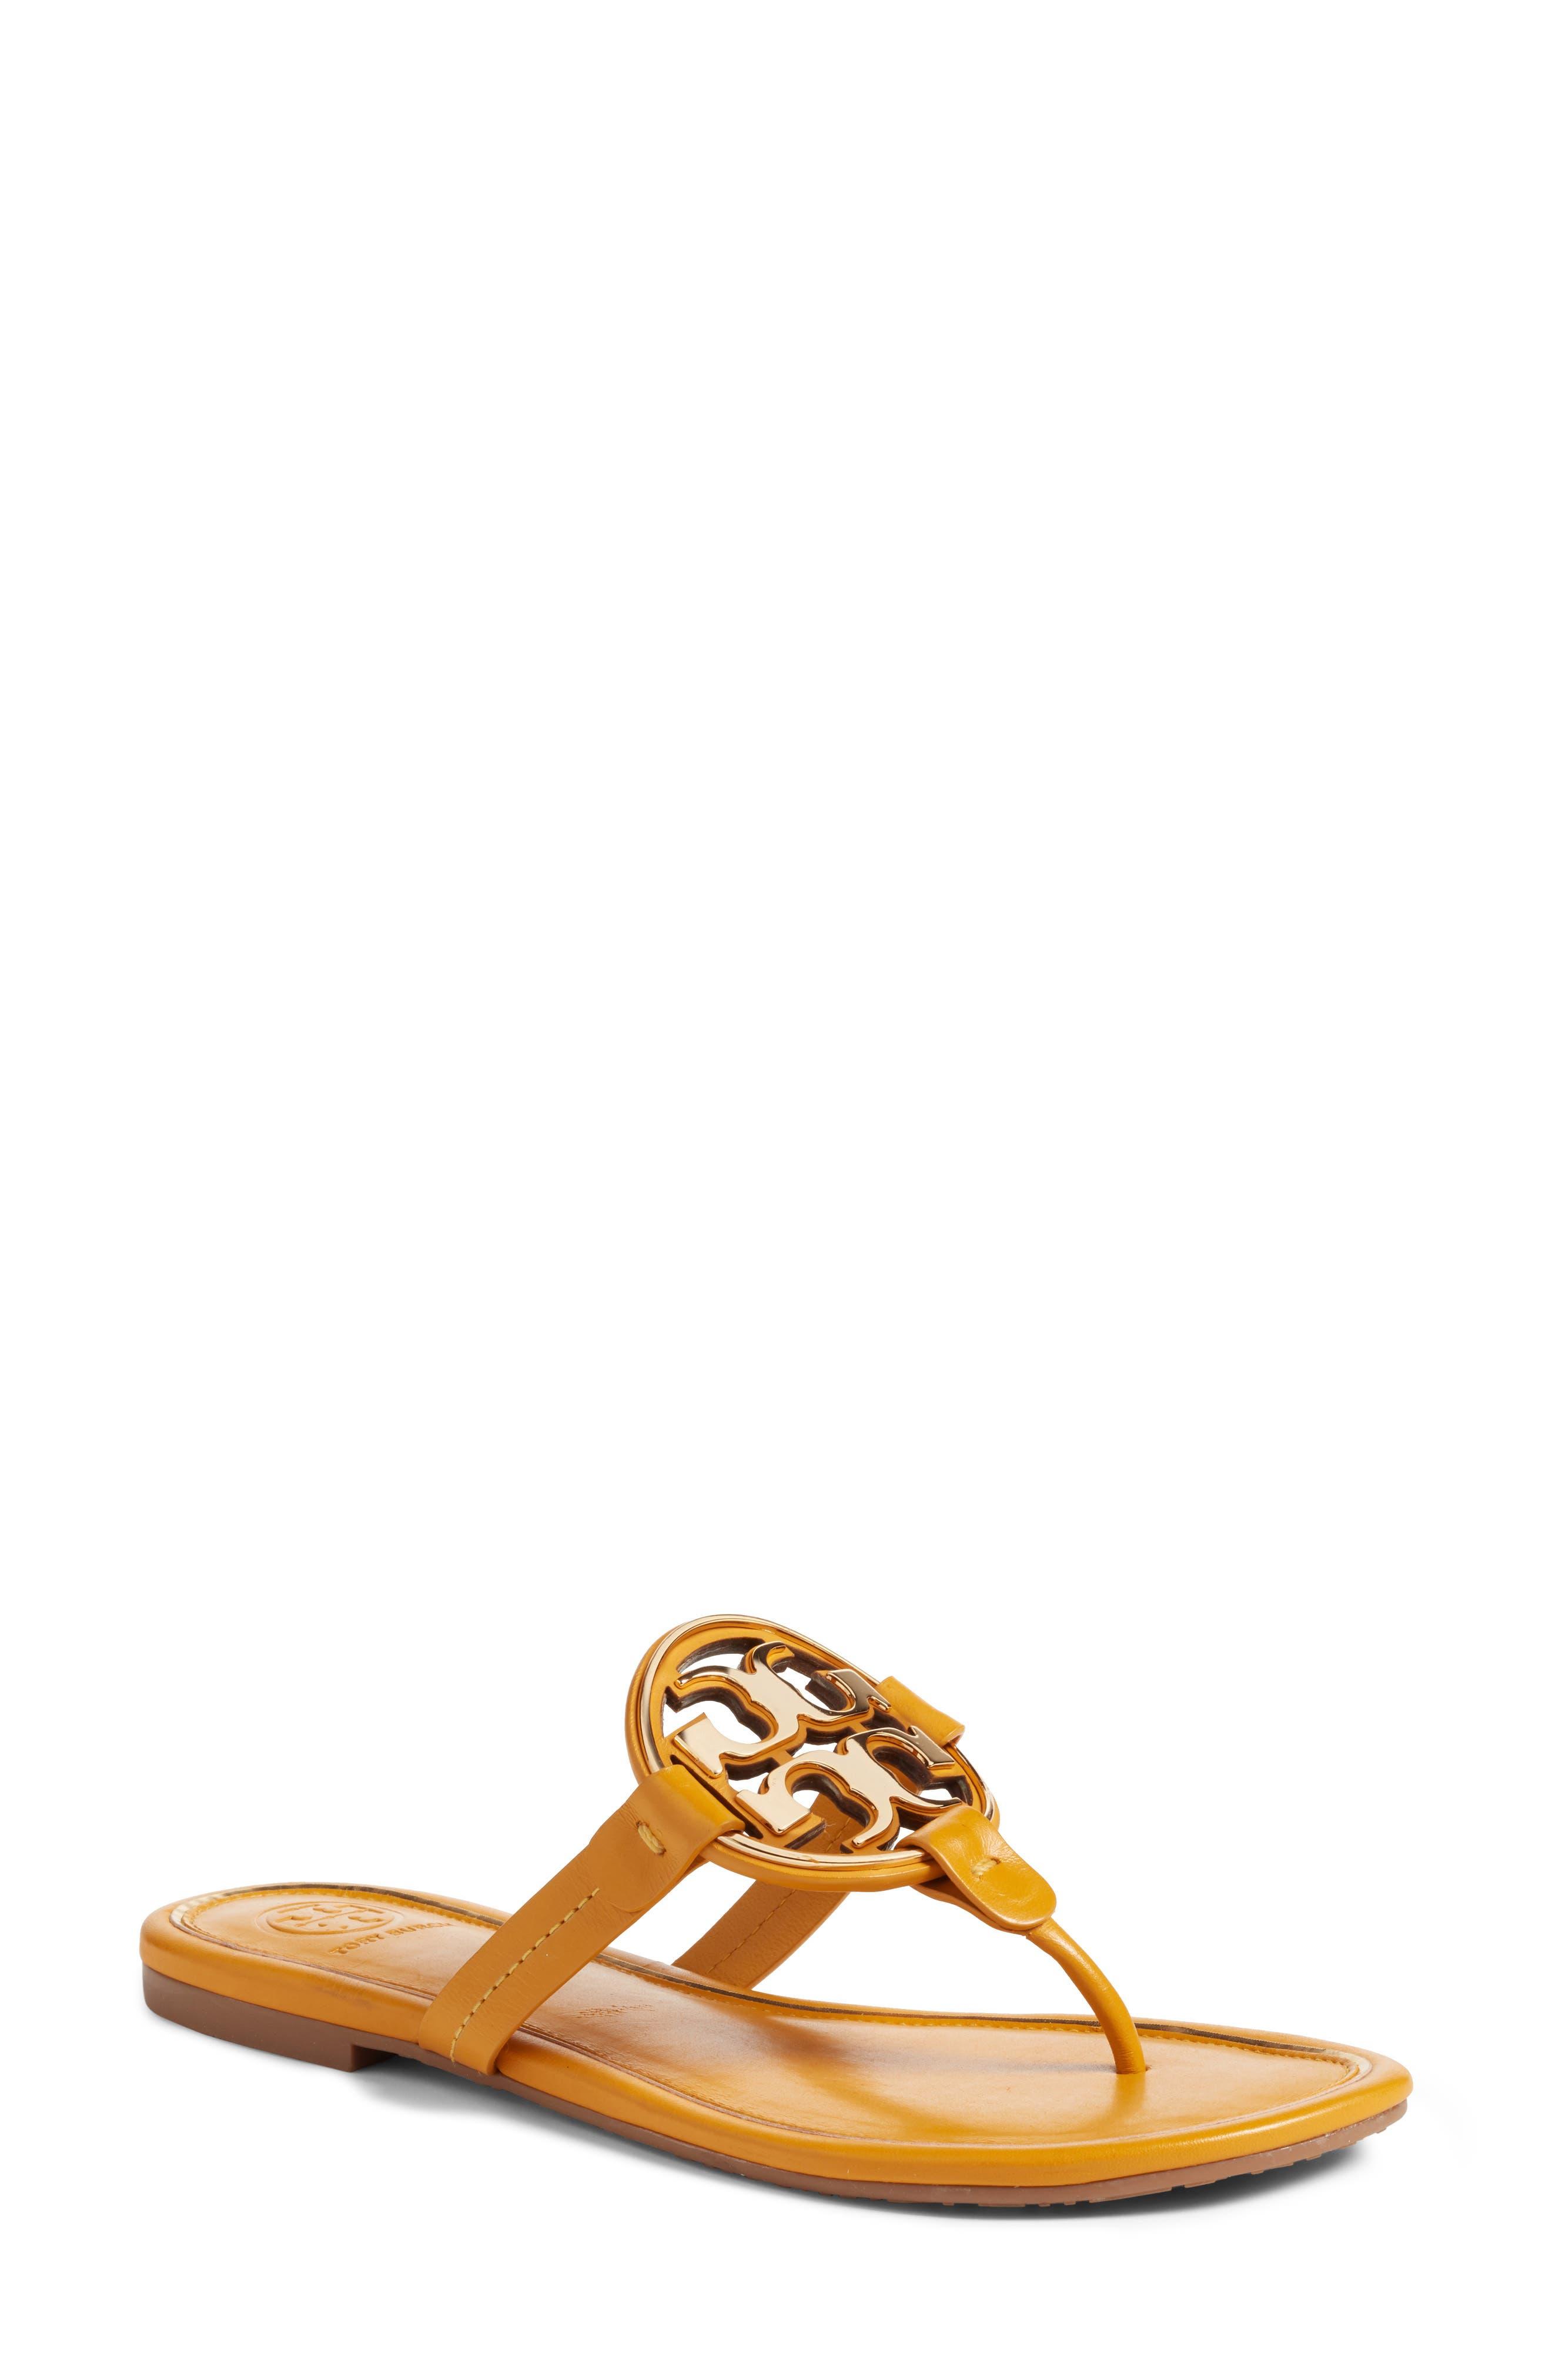 Tory BurchMILLER - T-bar sandals - spark gold 9udlp6cH